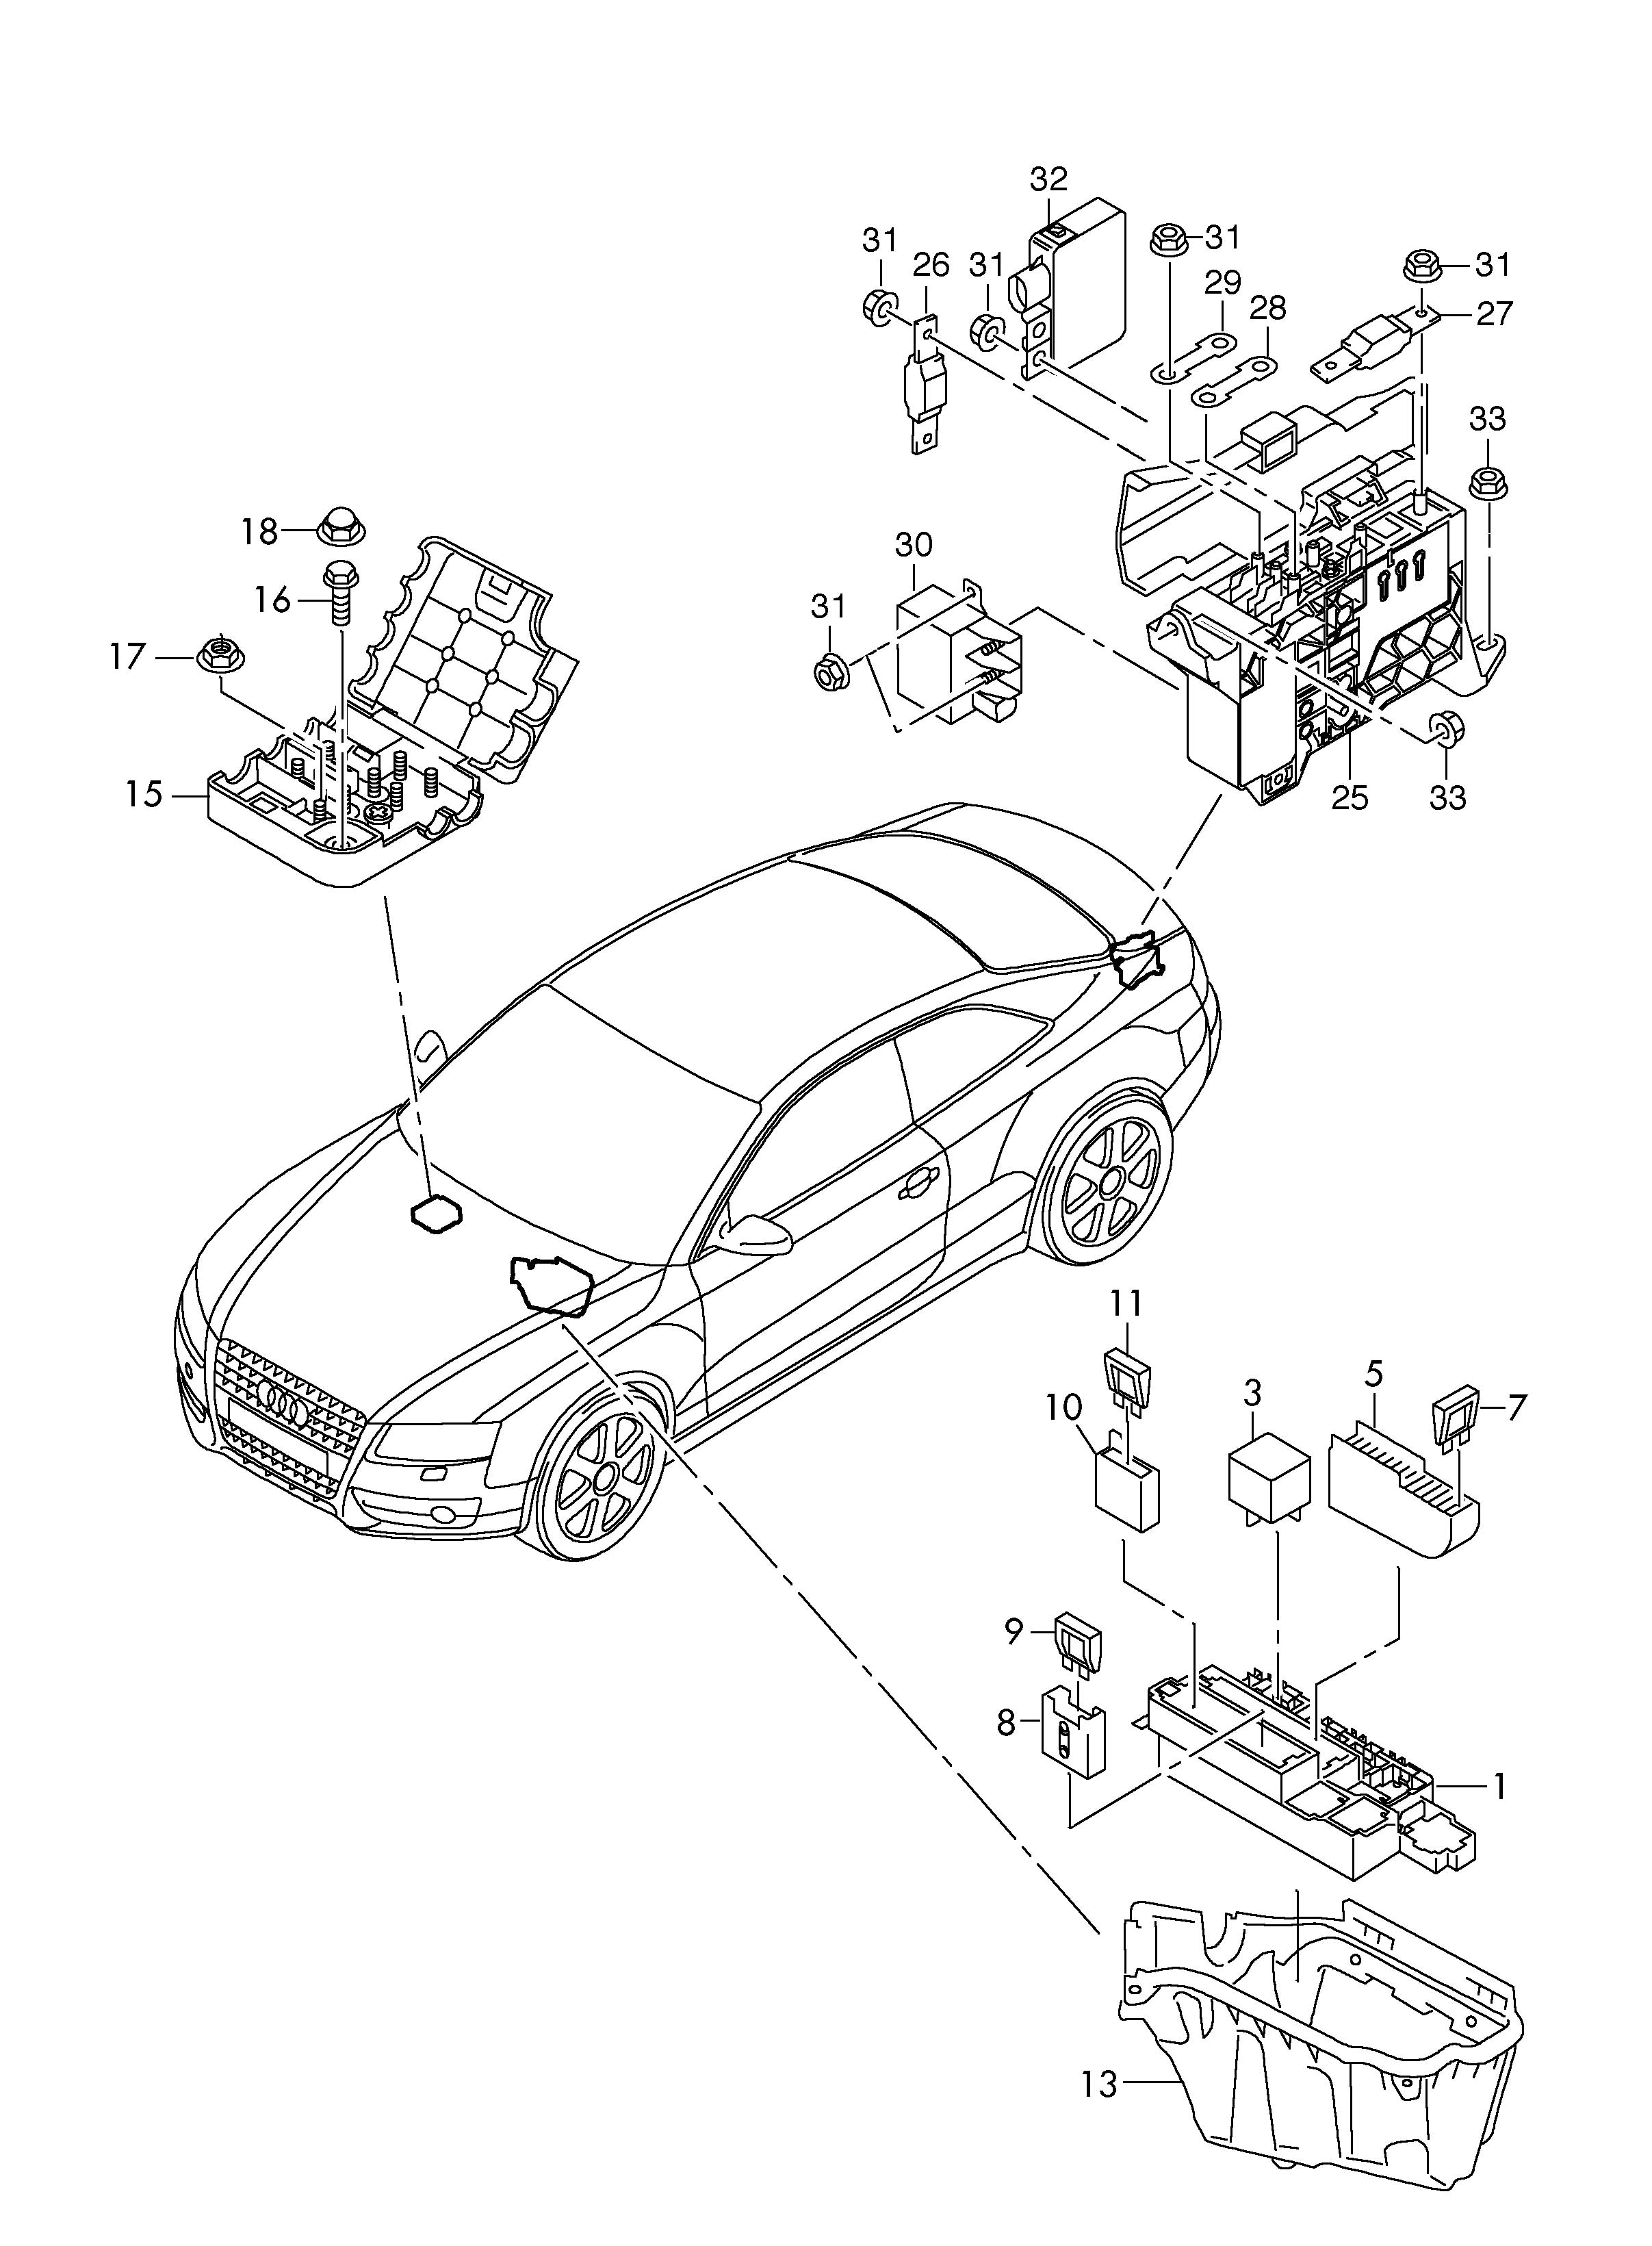 bmw 2002 tii wiring diagram best wiring library Nissan Wiring Diagrams bmw 2002tii wiring diagram